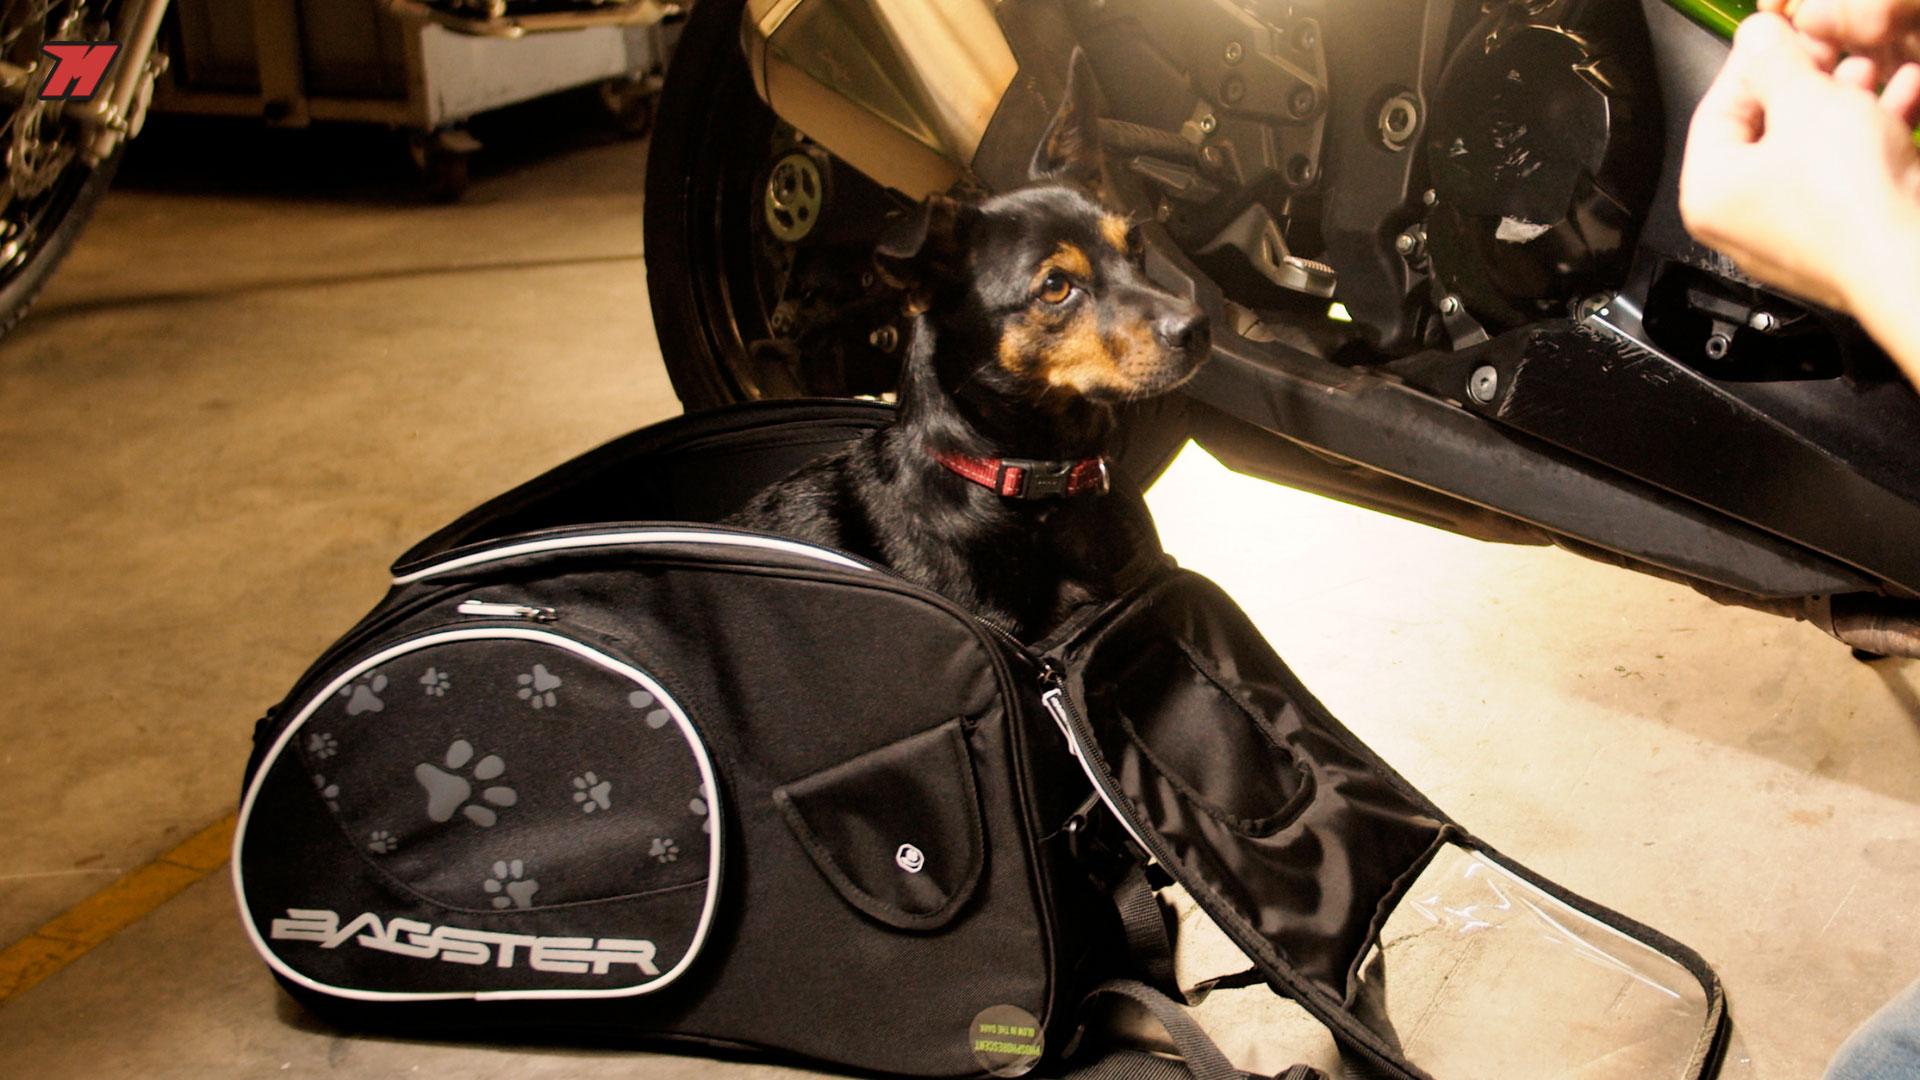 Bolsa sobredepósito para moto para tu perro o gato.